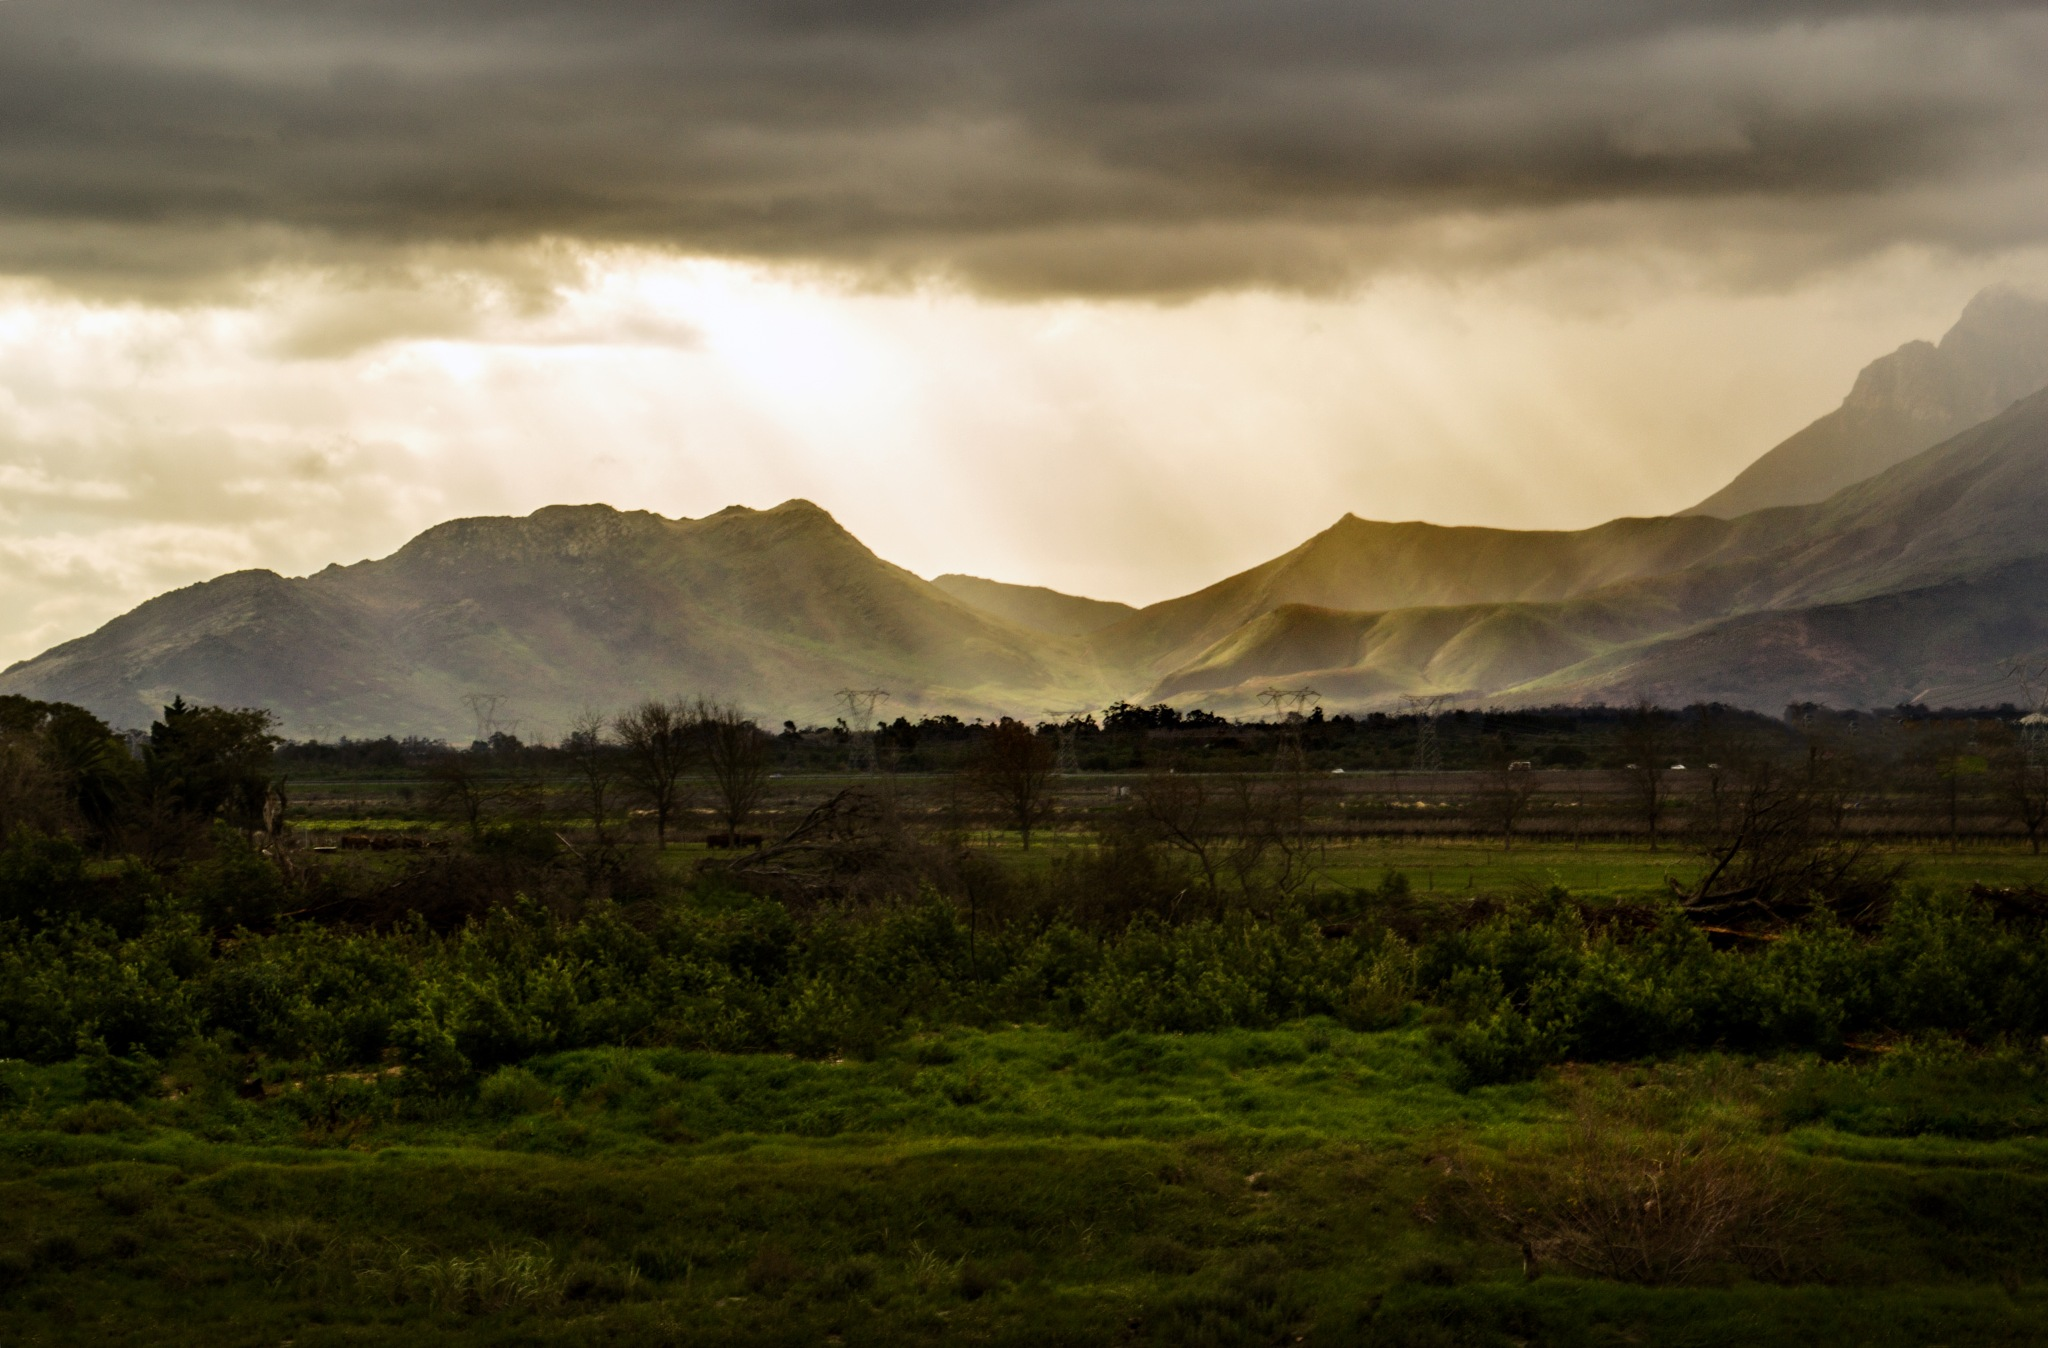 Sunrays on the mountains by Nauta Piscatorque